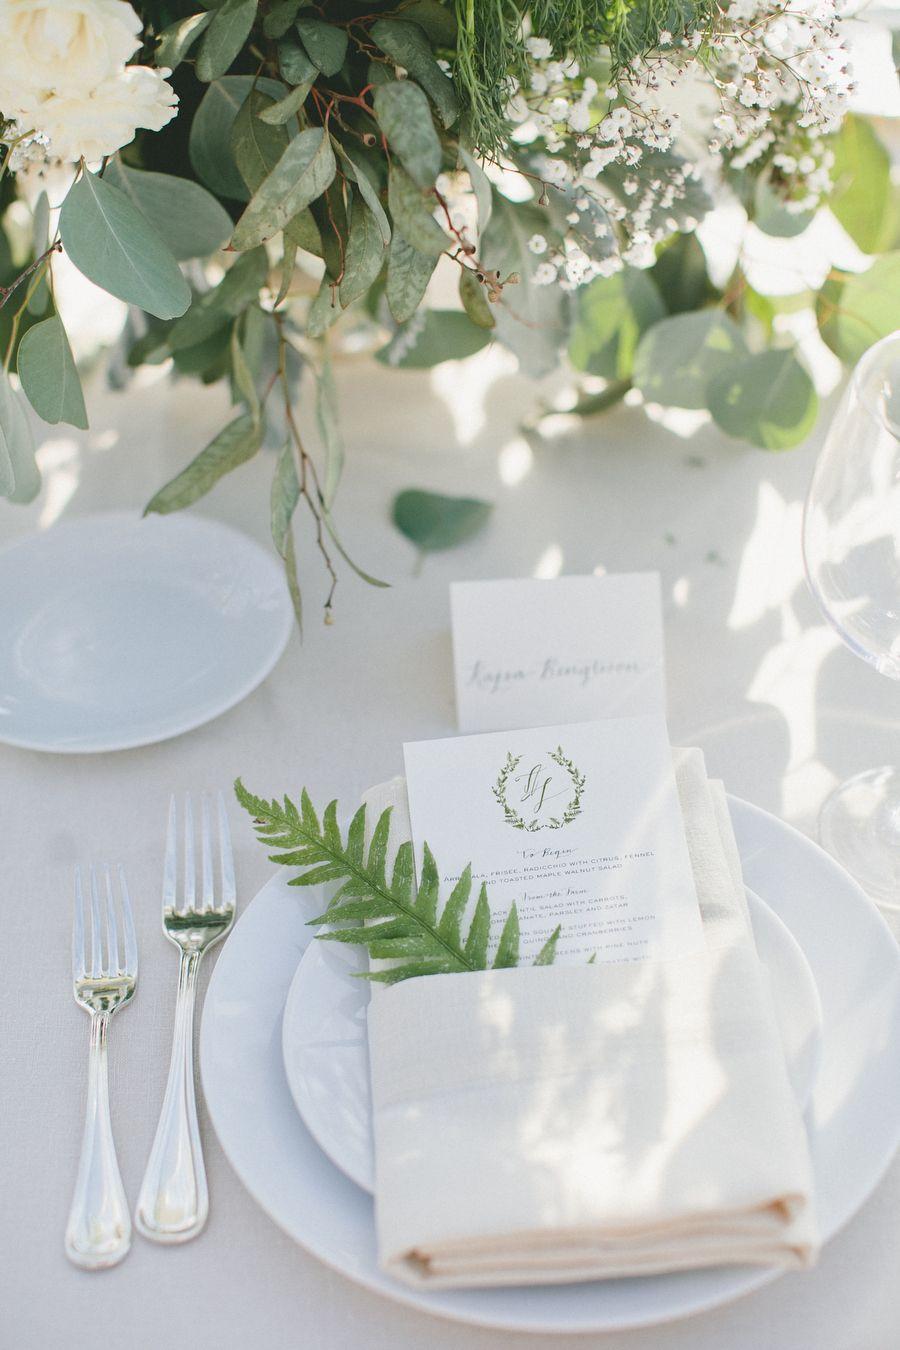 Rustic Bonny Doon Wedding with Scandinavian Traditions   Weddings ...